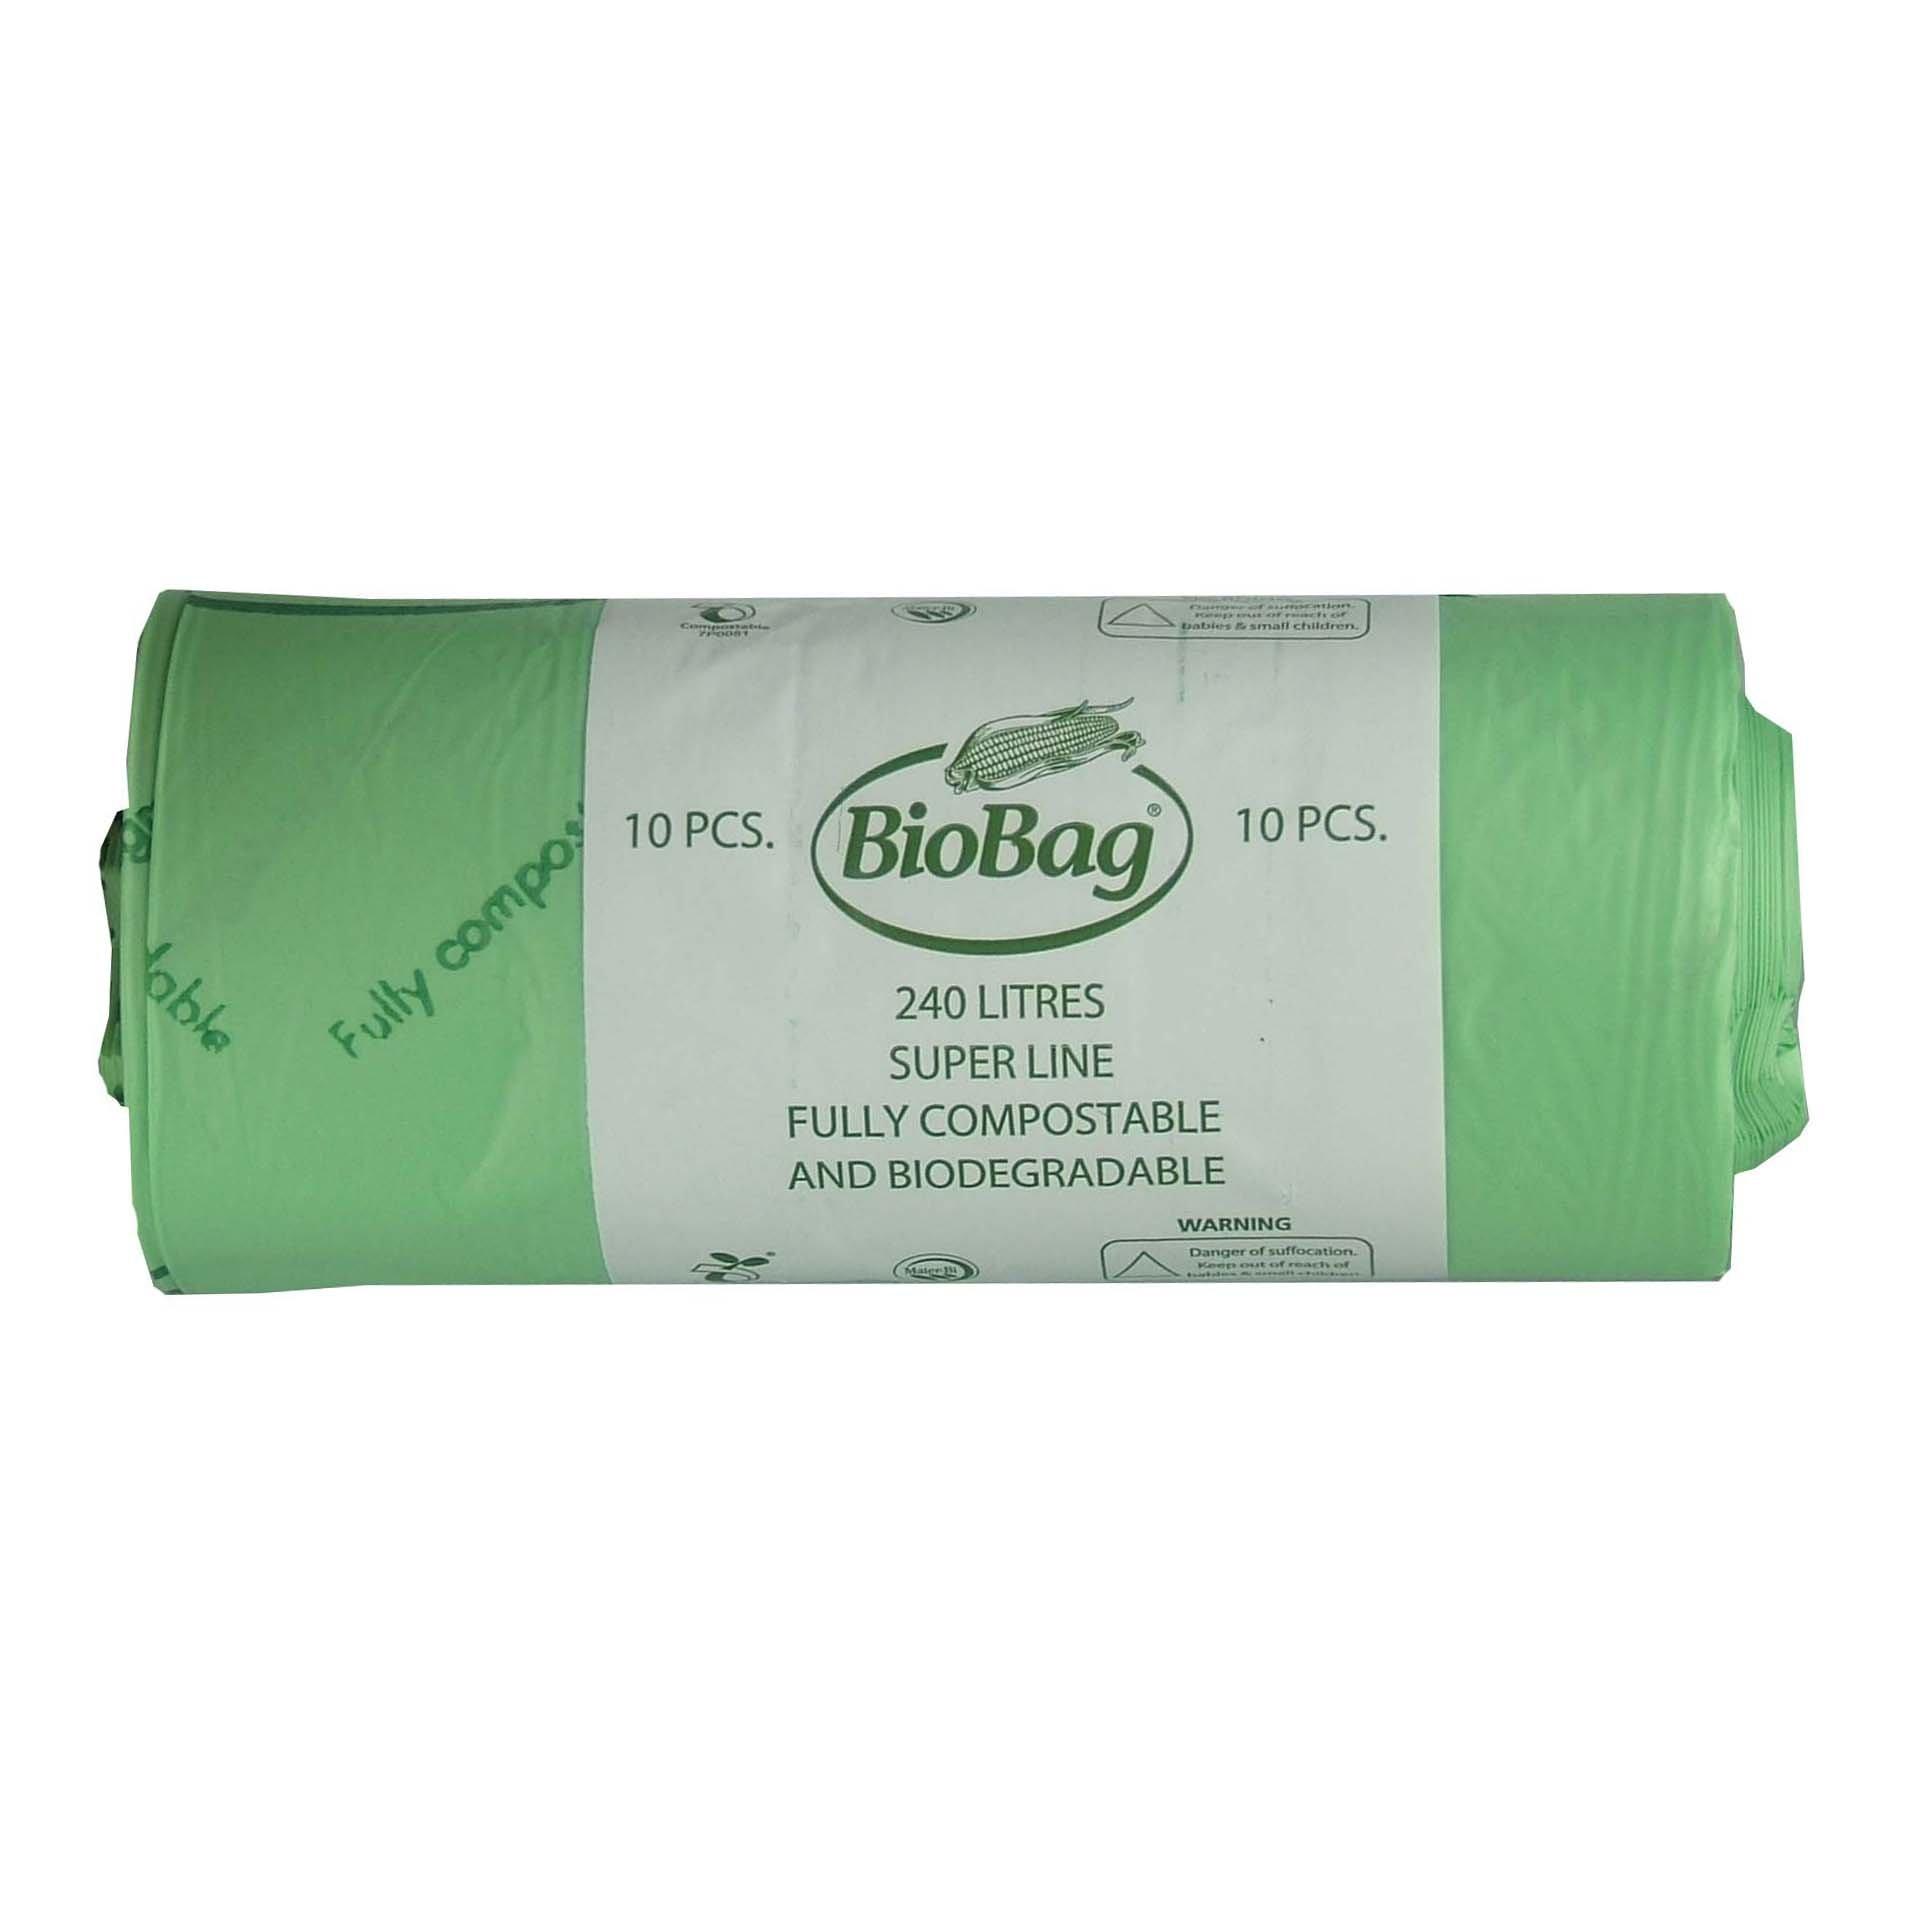 all green 240 litre biobag compostable wheelie bin liners. Black Bedroom Furniture Sets. Home Design Ideas